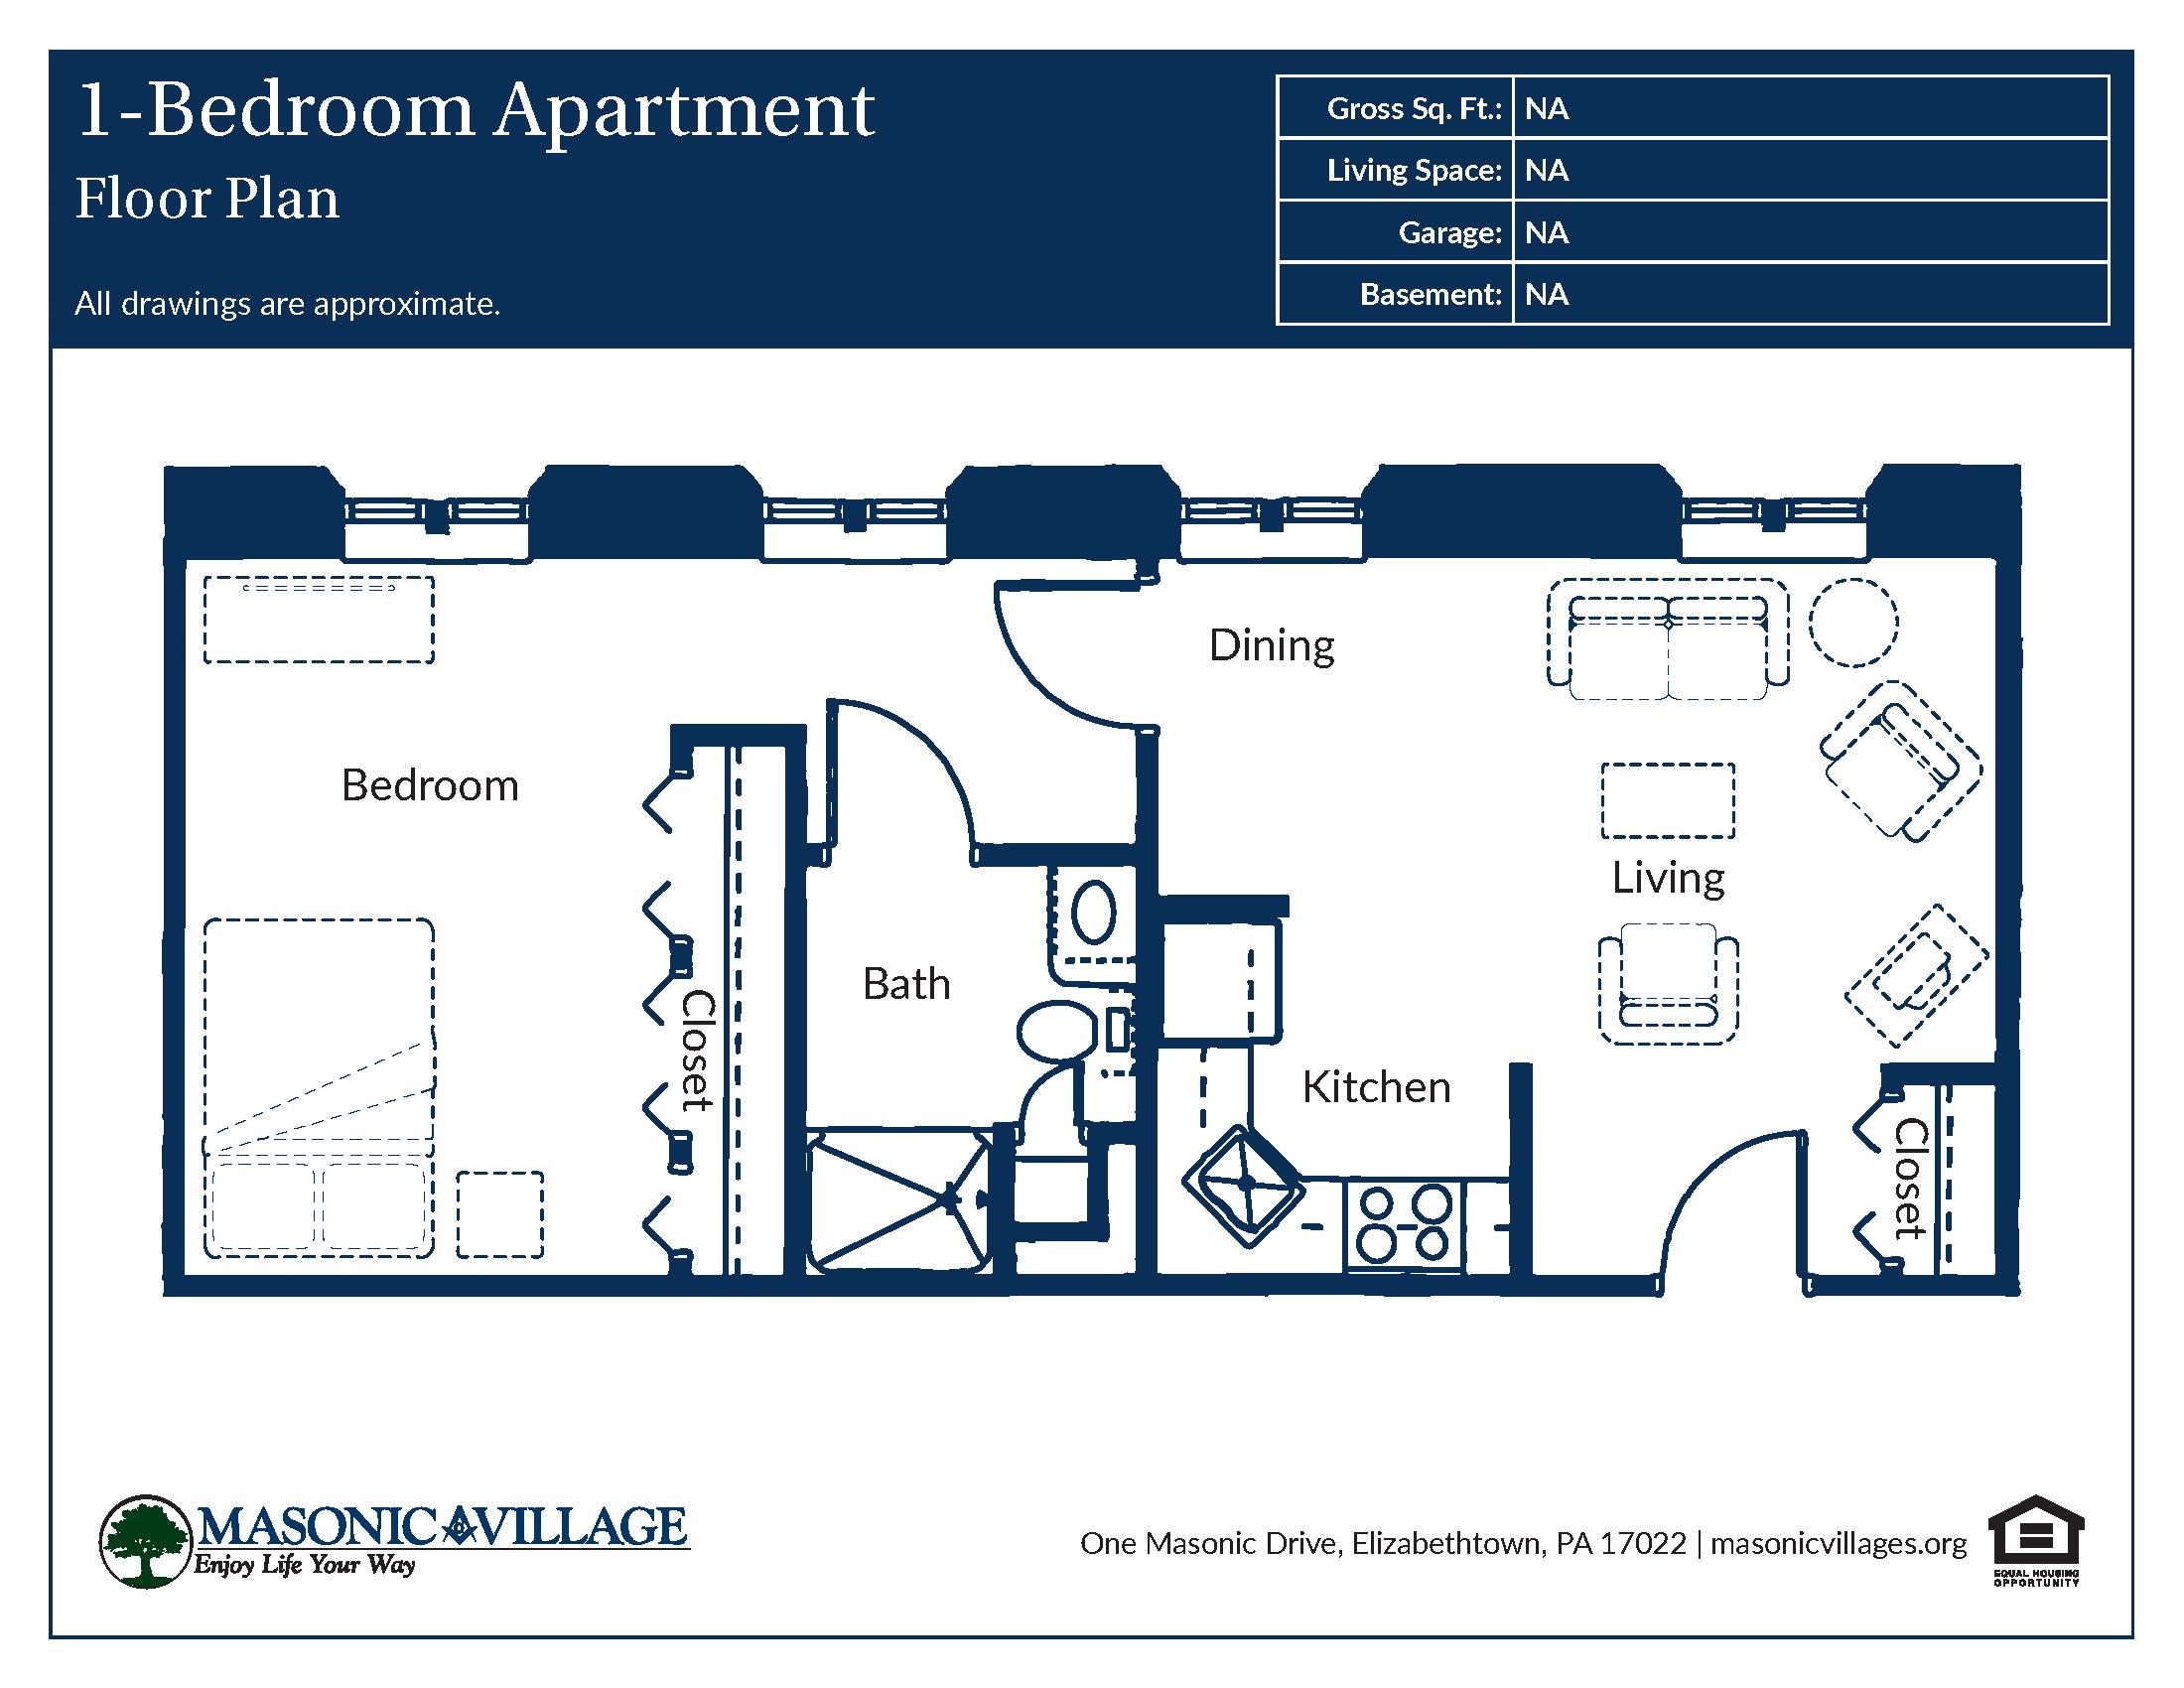 Masonic Village at Elizabethtown - 1 Bedroom Apartment